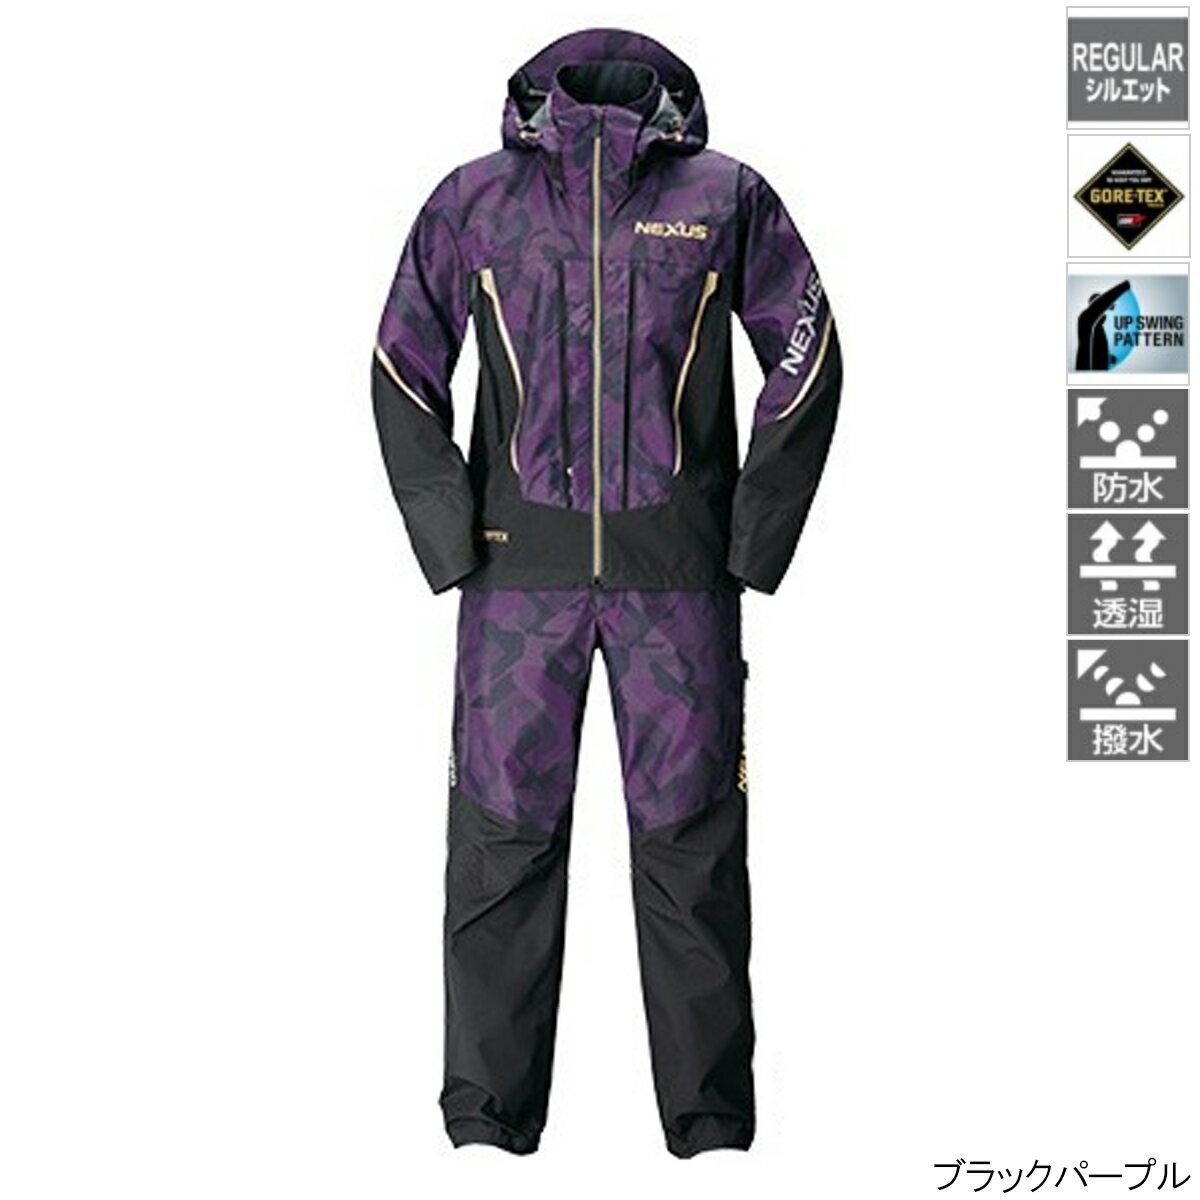 NEXUS GORE-TEX レインスーツ EX RA-119T M ブラックパープル シマノ【同梱不可】